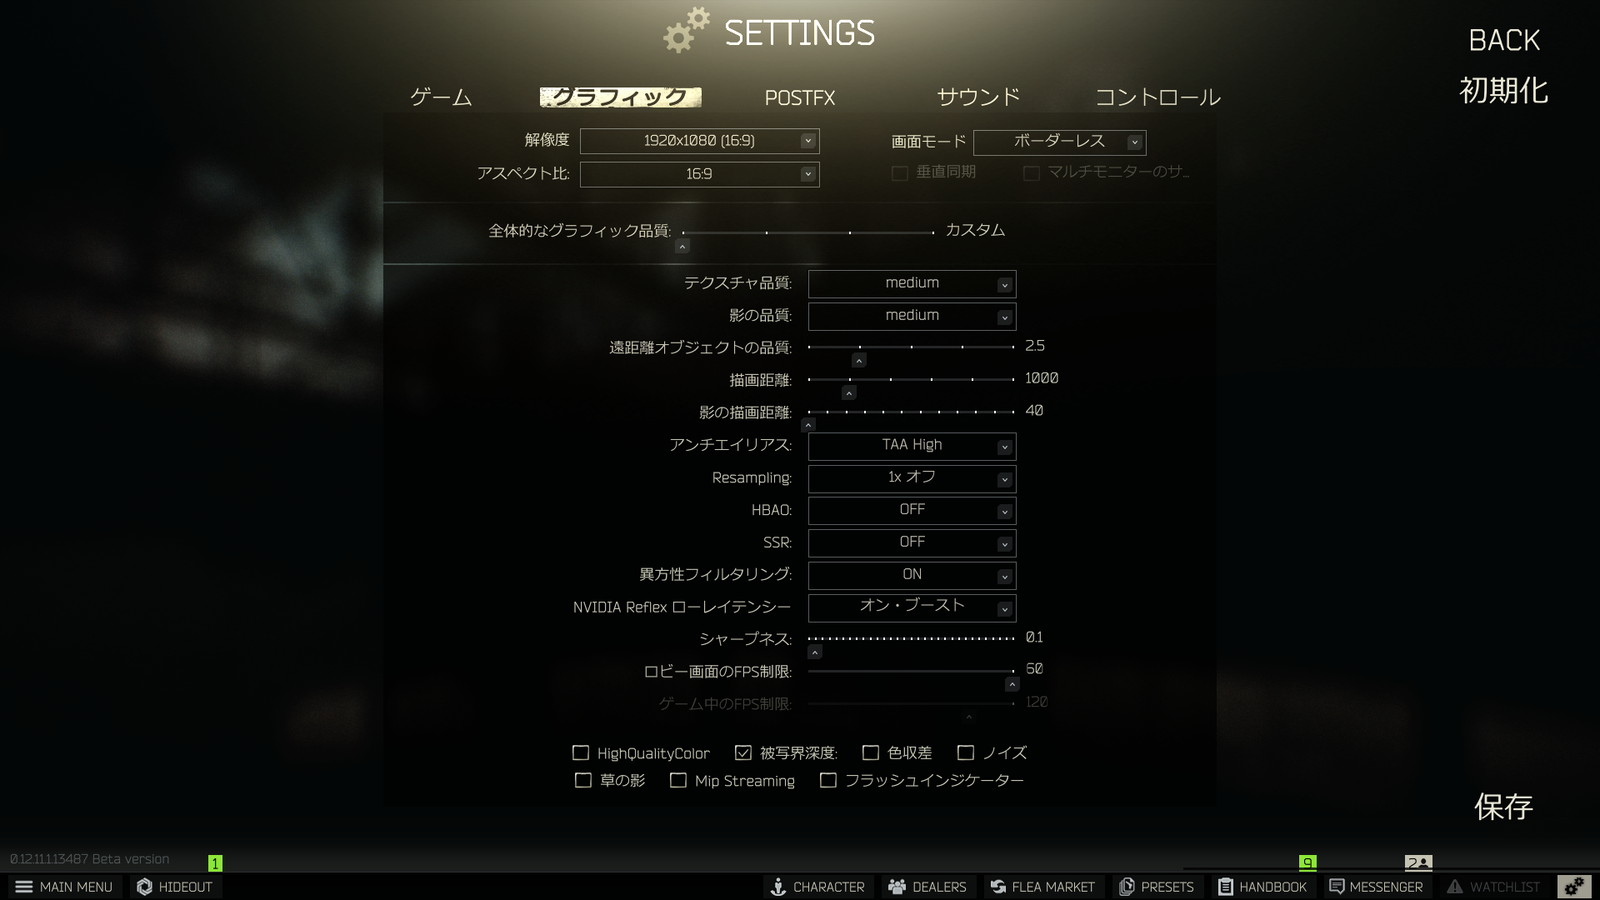 f:id:gamelifecompany55:20210807194637p:plain